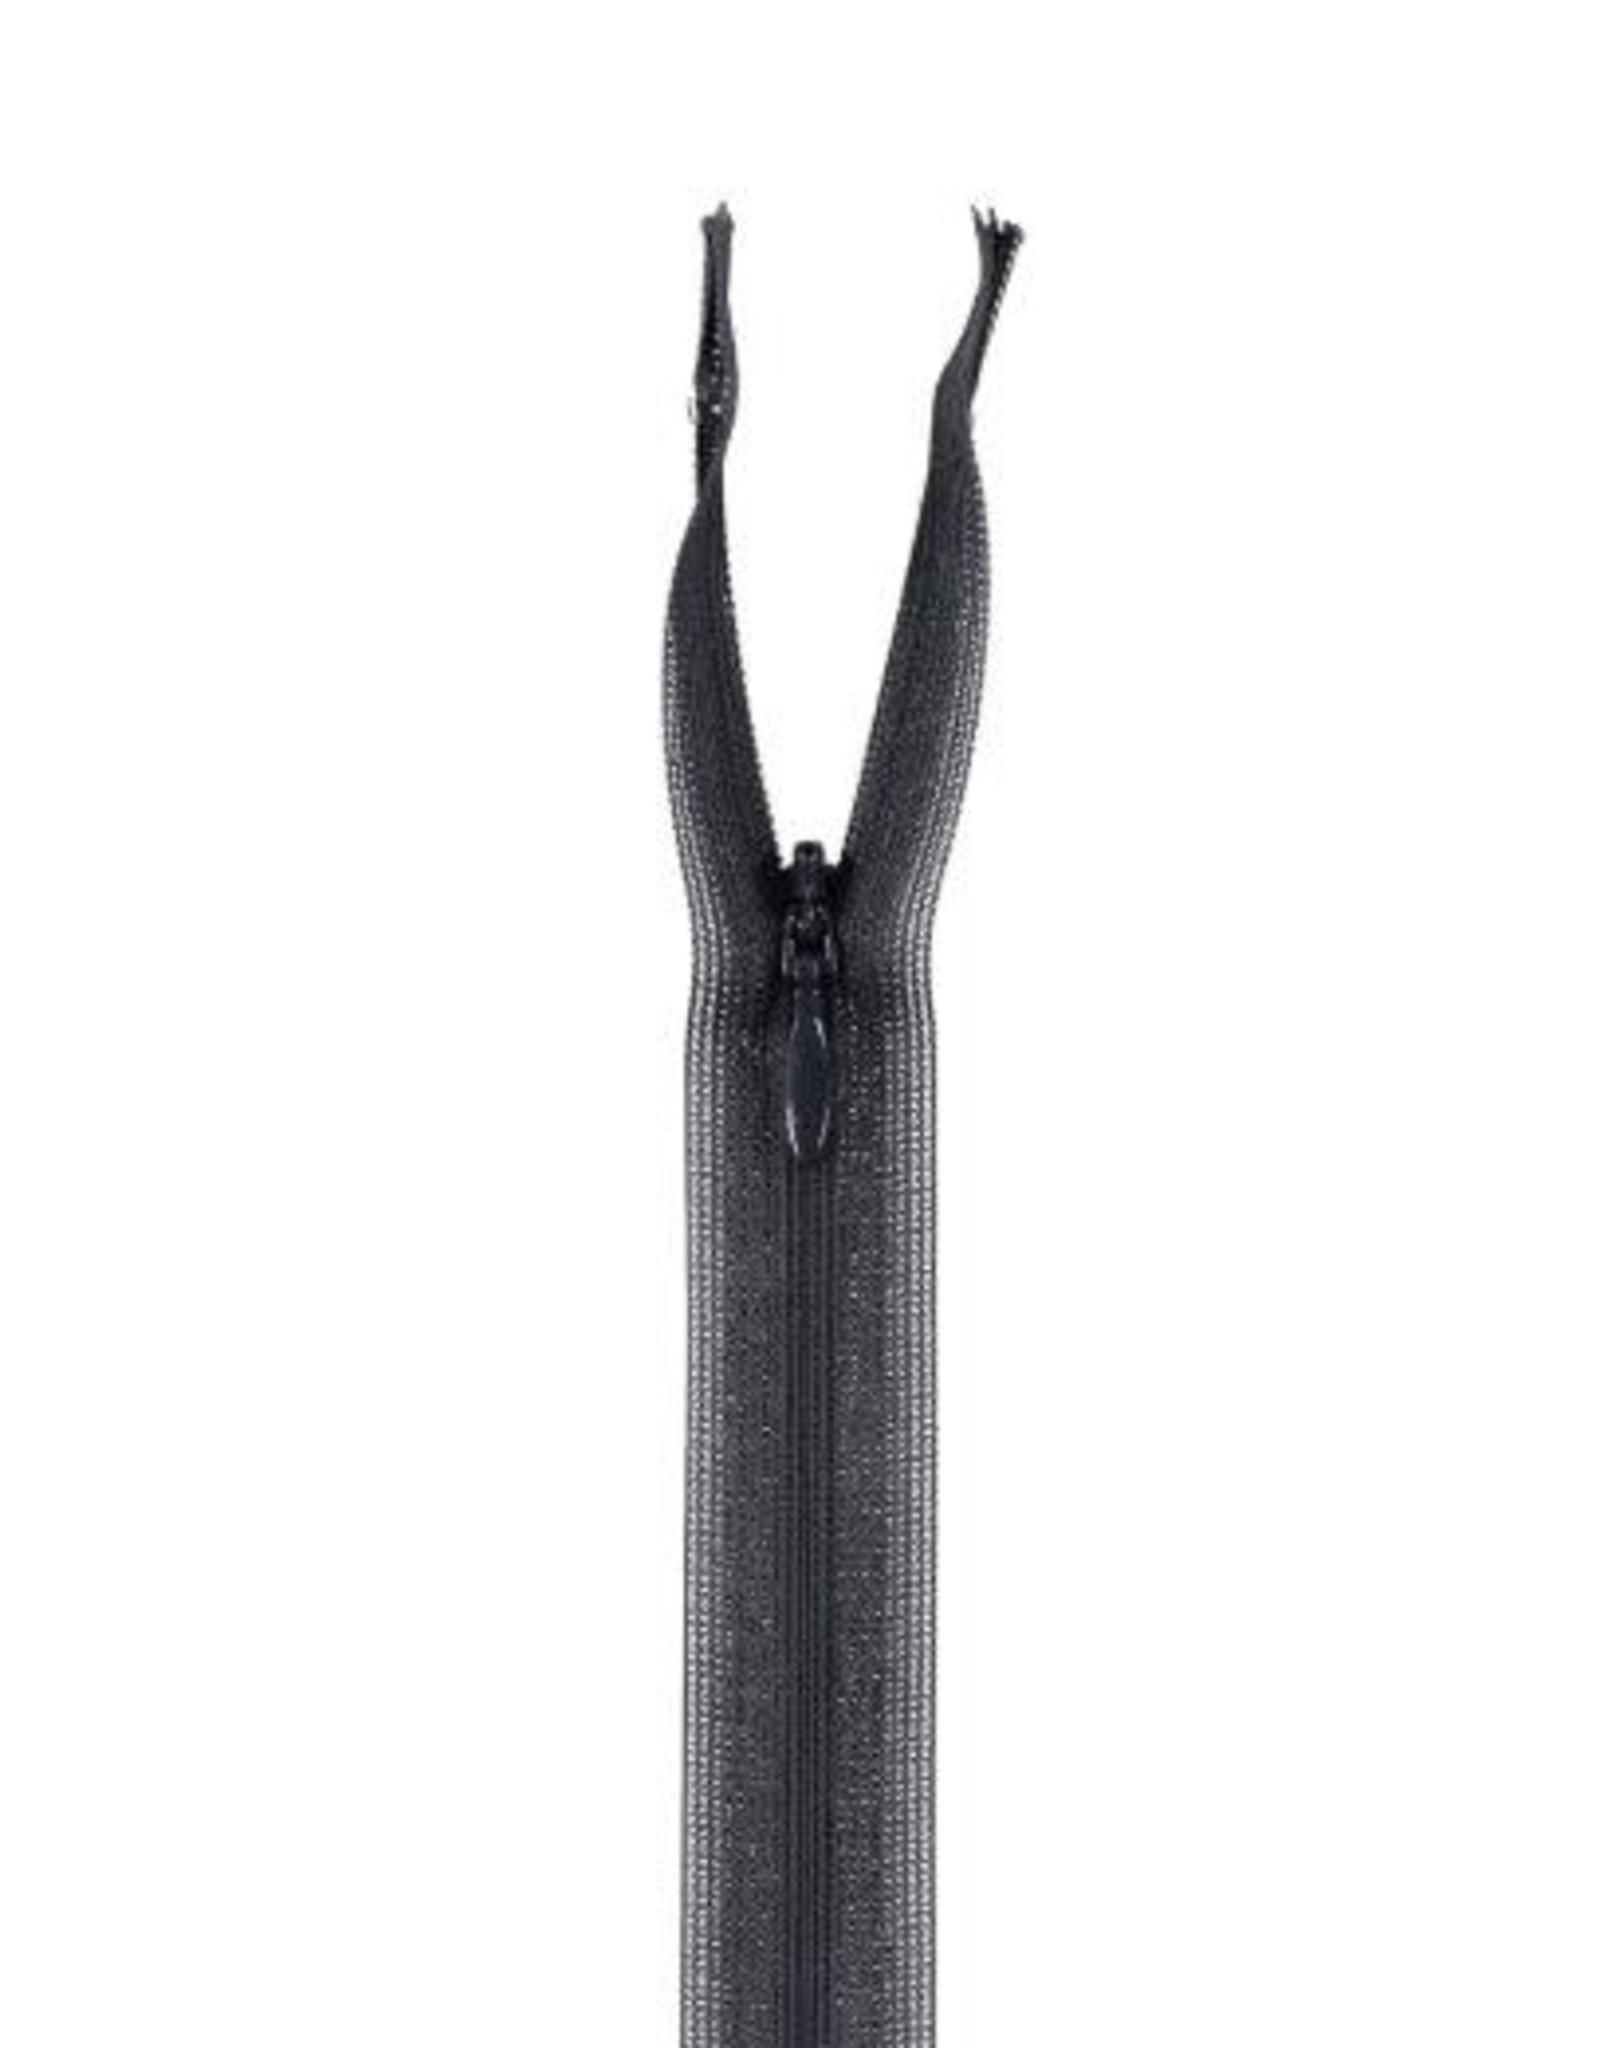 YKK NAADVERDEKTE RITS C NIET-DEELBAAR (p.1st) 71-60cm